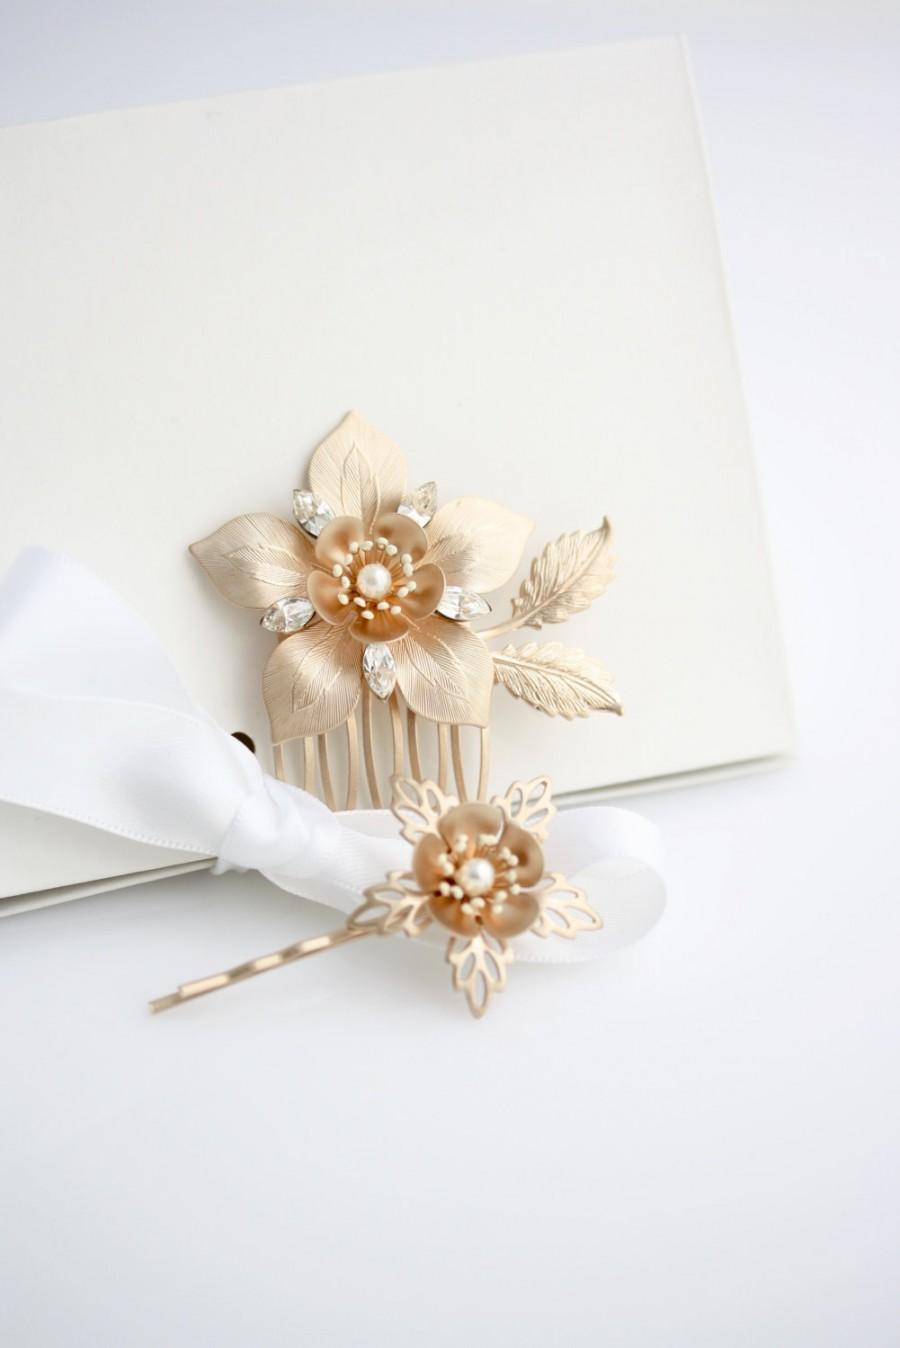 Mariage - Rose Gold Bridal Comb Set Rose Gold Wedding Hair Pin Set Flower Comb Matt Rose Gold Wedding Hair Accessory Rose Gold Hair Pins ALESSIA SET